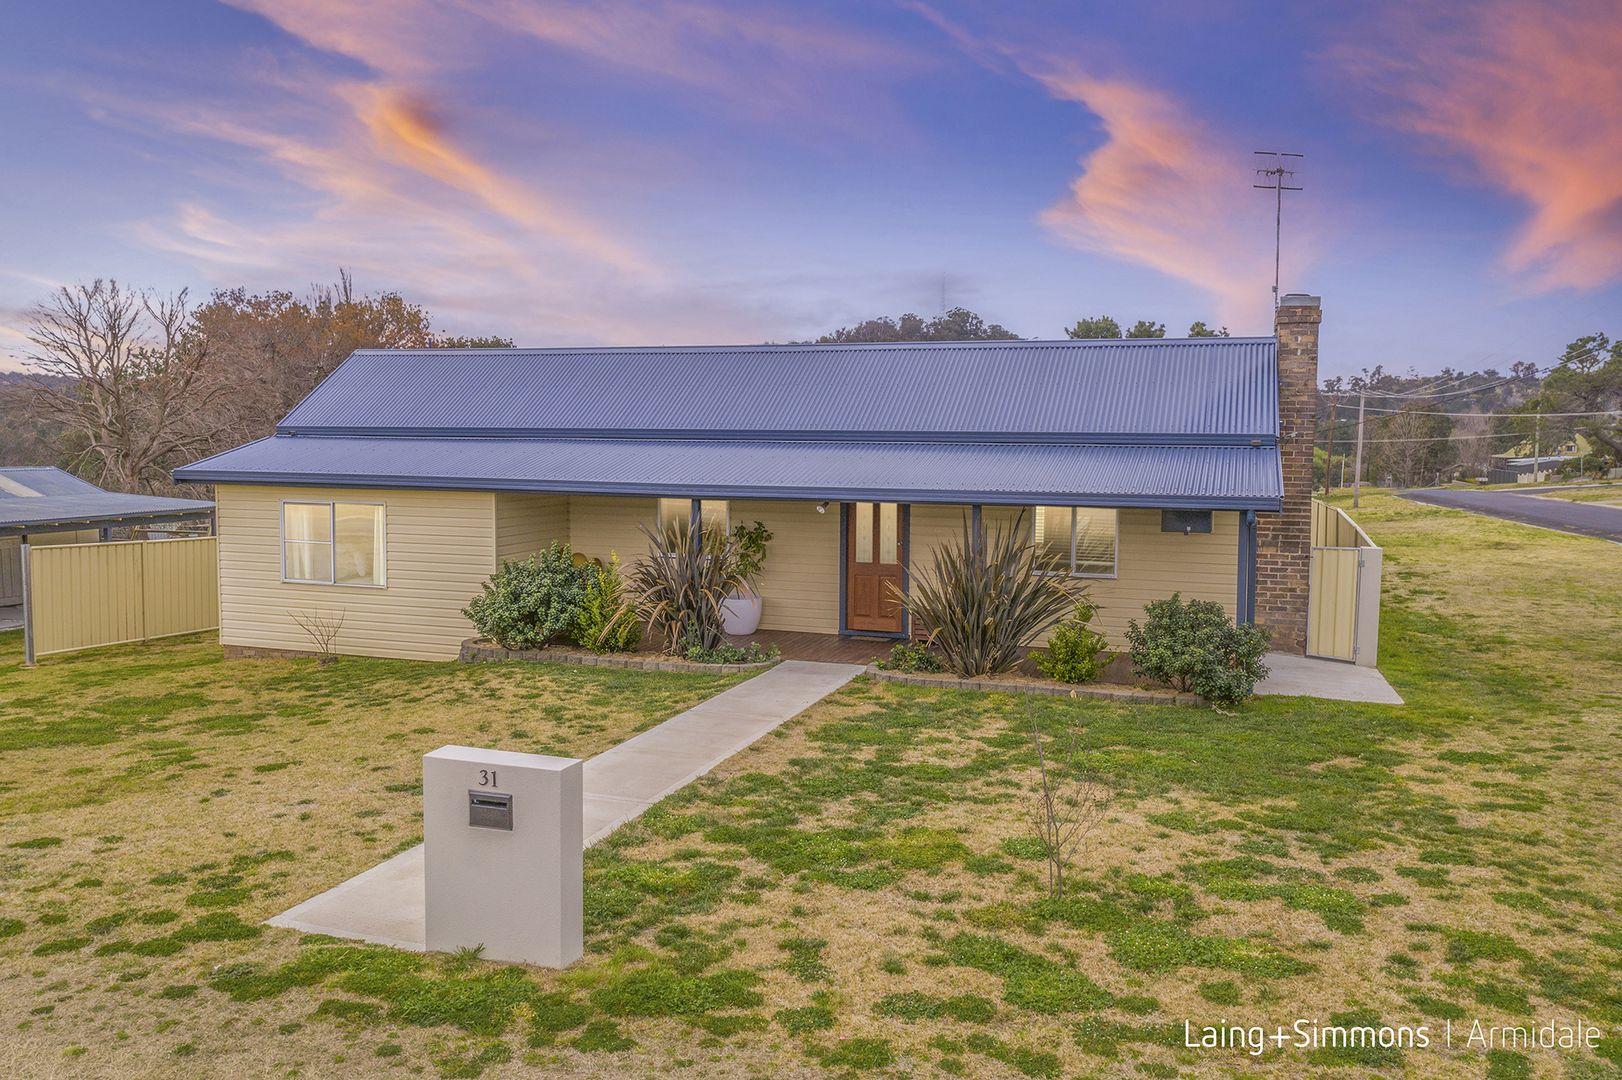 31 John Street, Uralla NSW 2358, Image 0